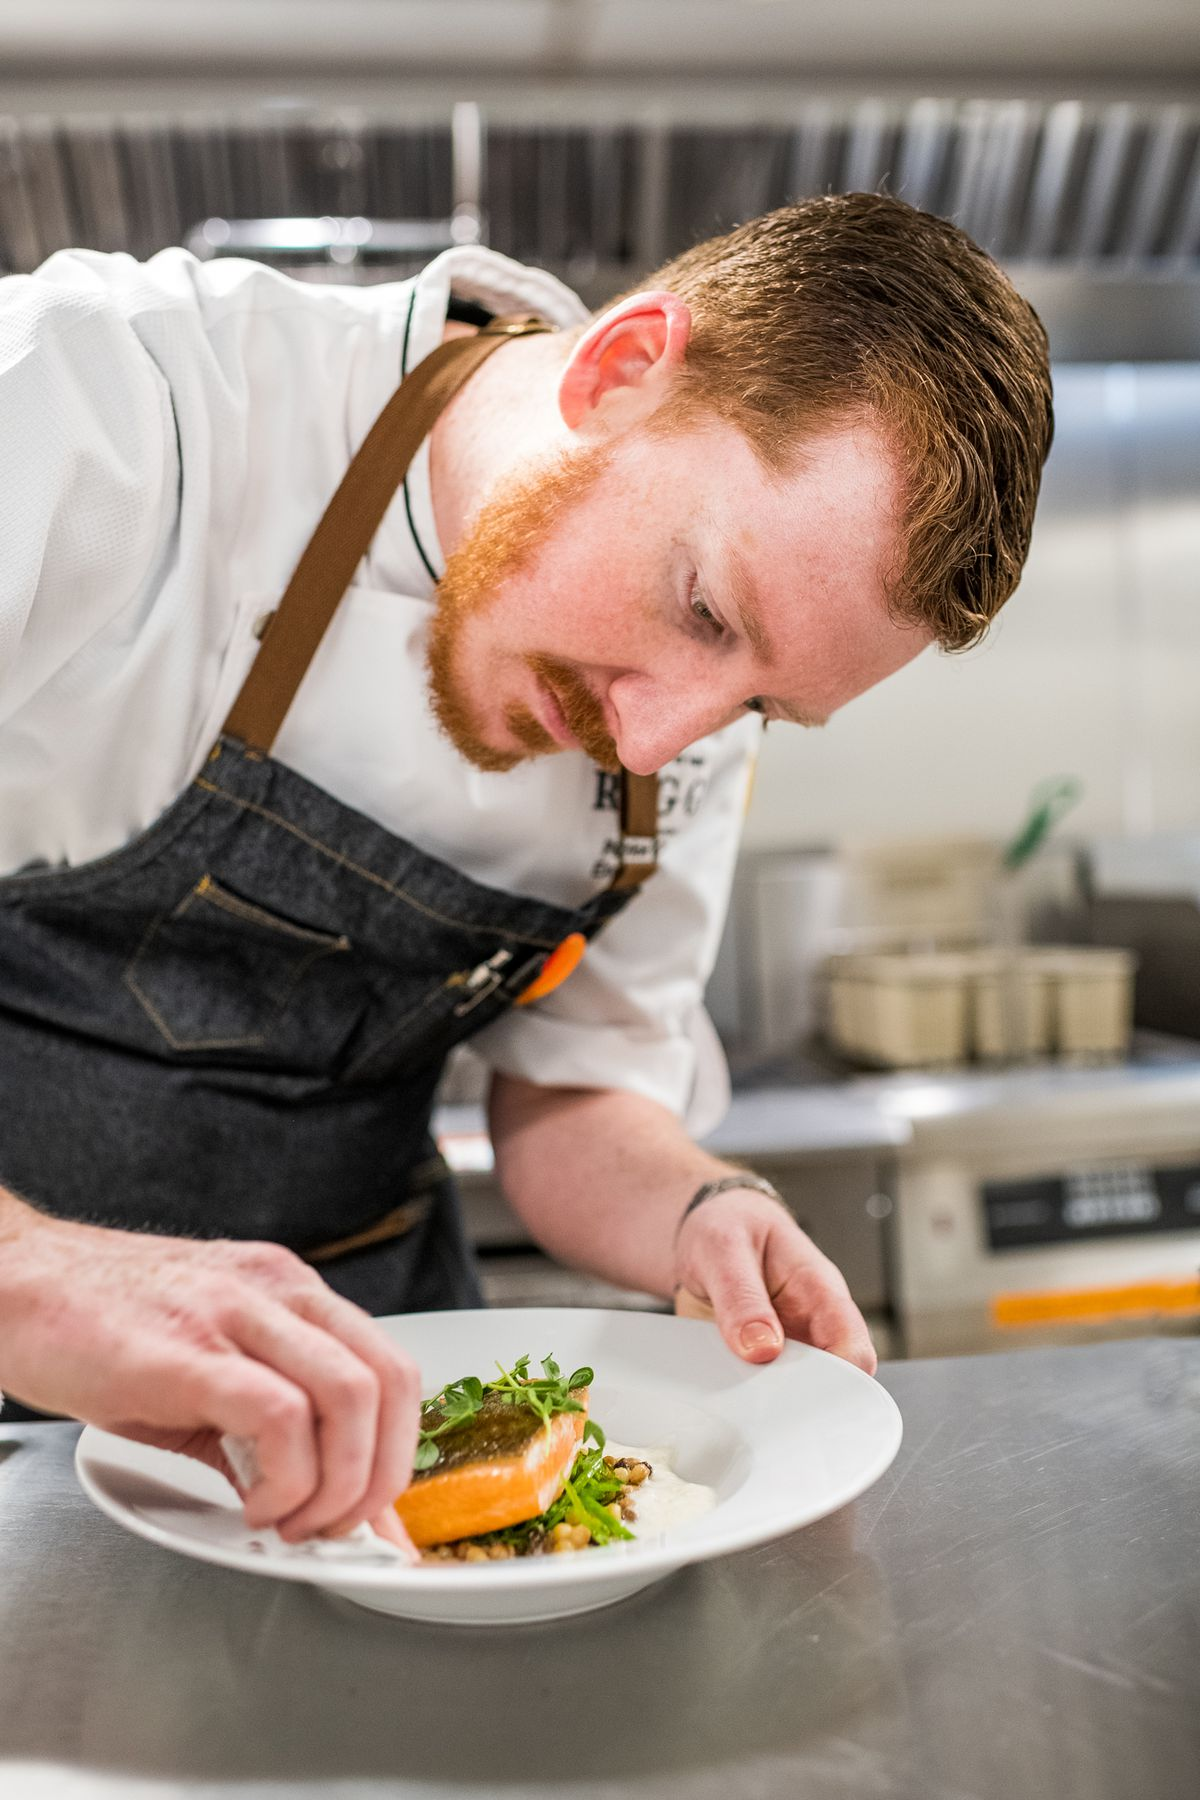 Patrick Curran plates an arctic char dish at Cafe Riggs